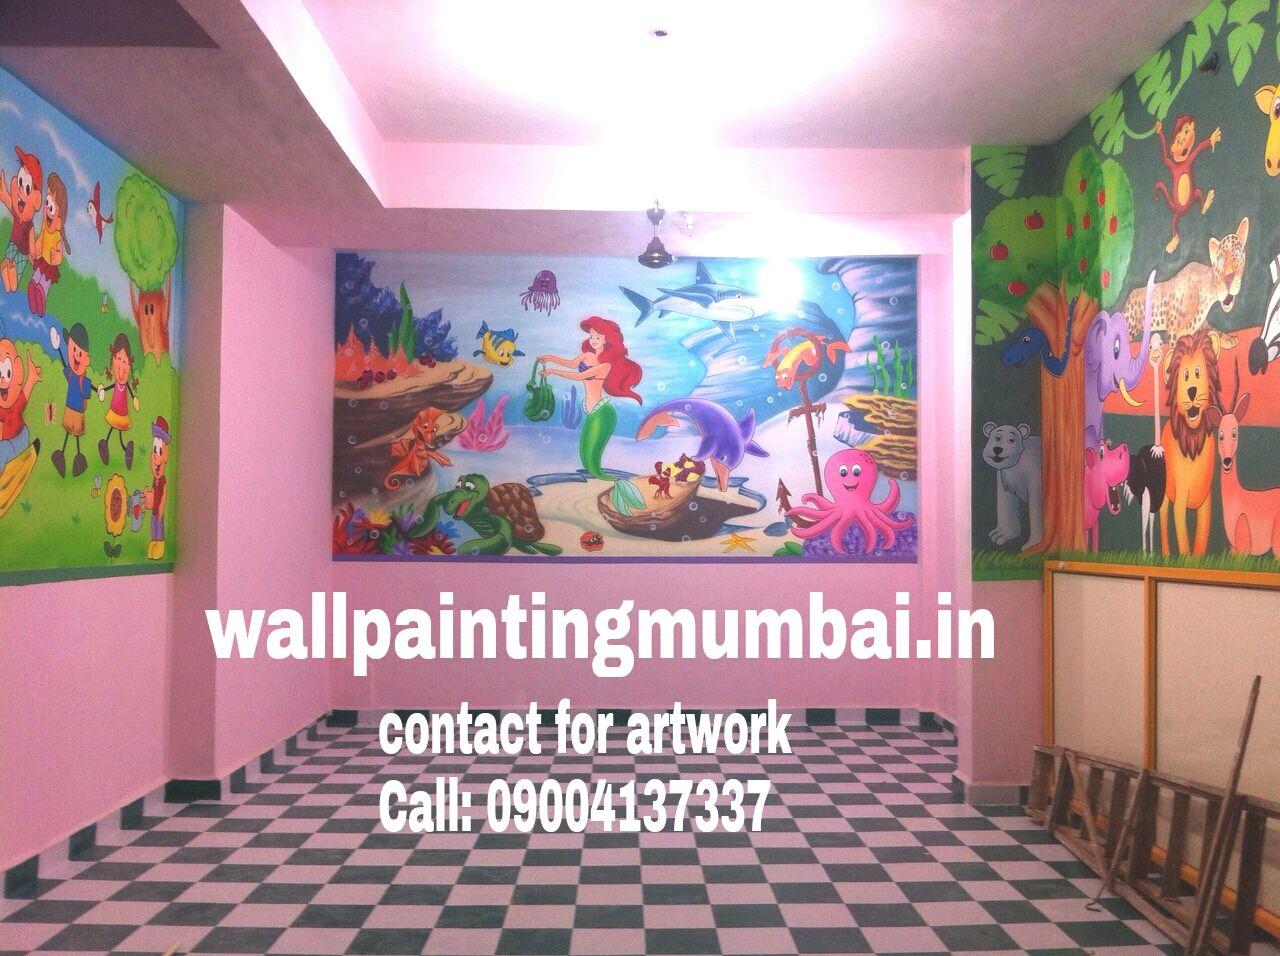 PLAY SCHOOL WALL ART: Playschool or Preschool Classroom